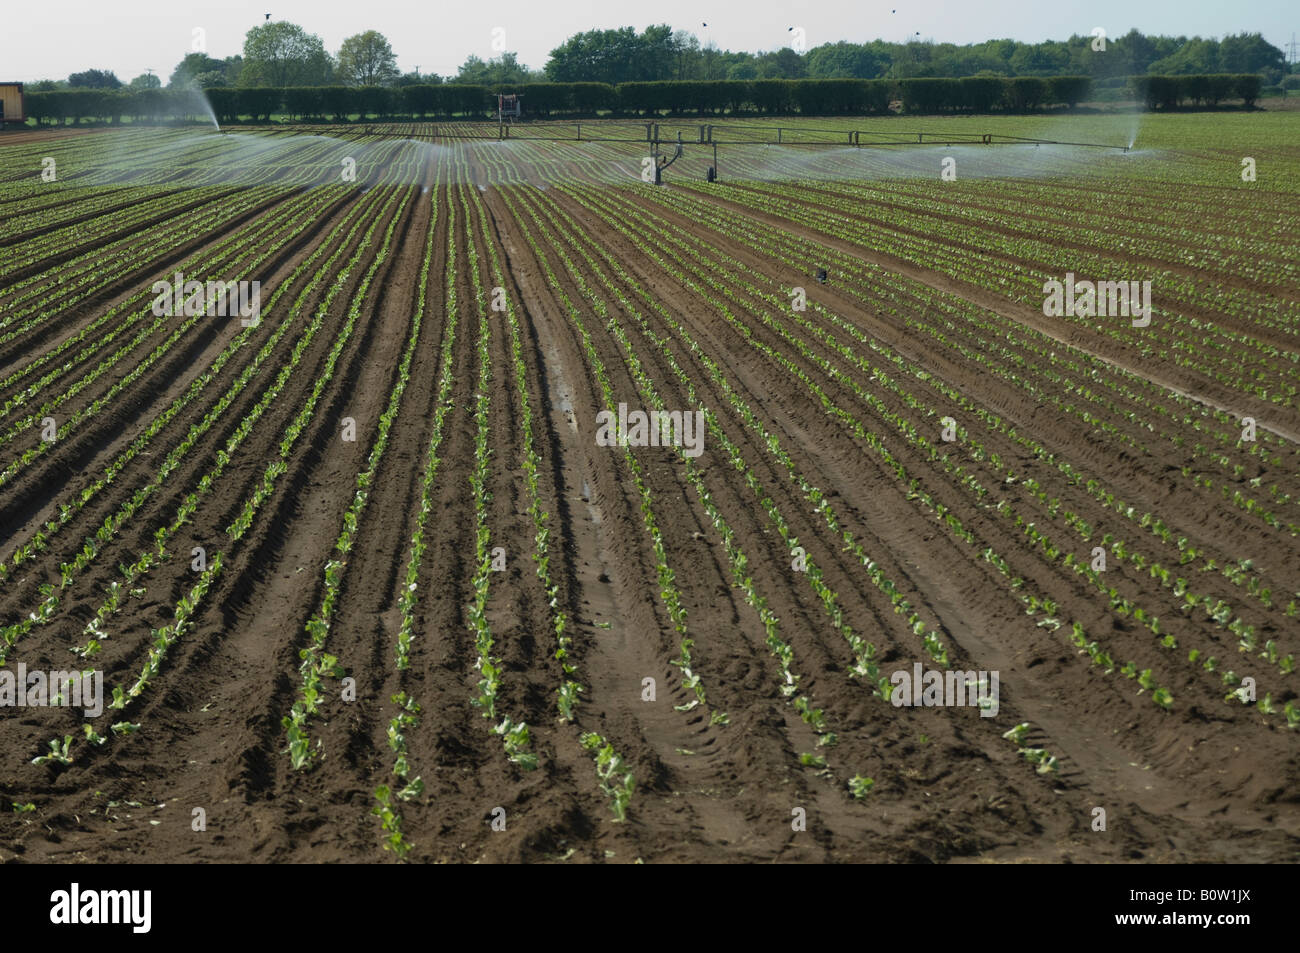 Irrigating lettuce plants Pocklington Yorkshire Stock Photo